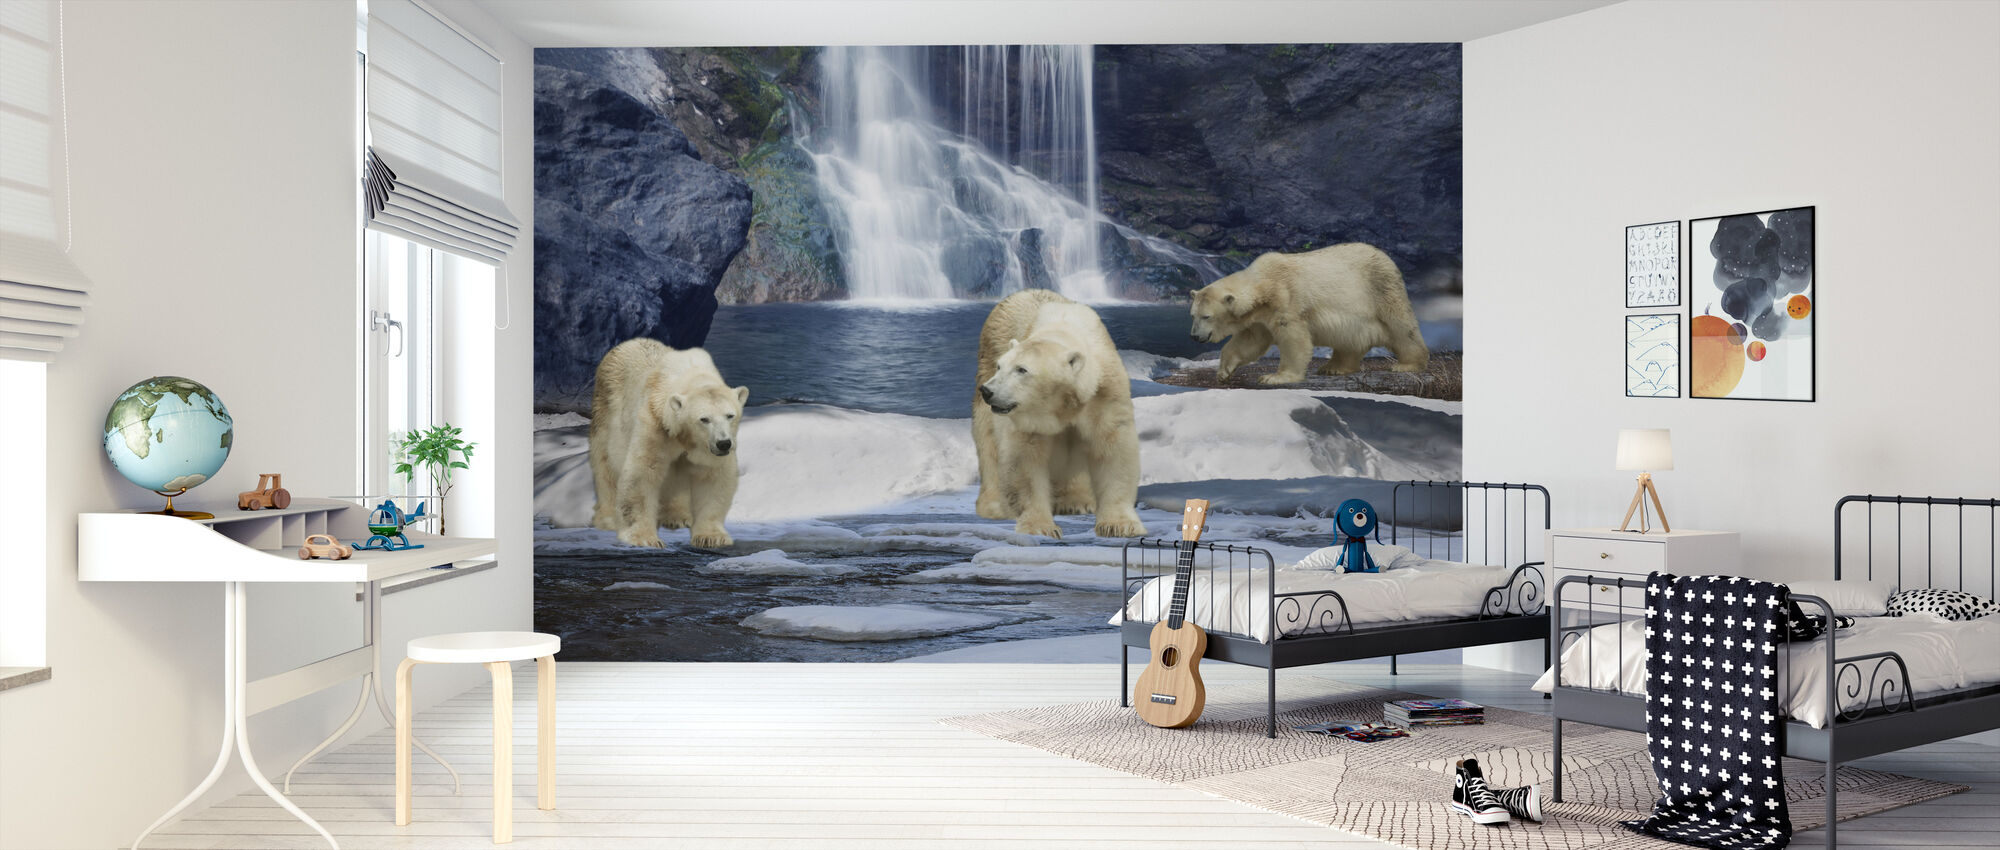 Polarbear Talvi - Tapetti - Lastenhuone